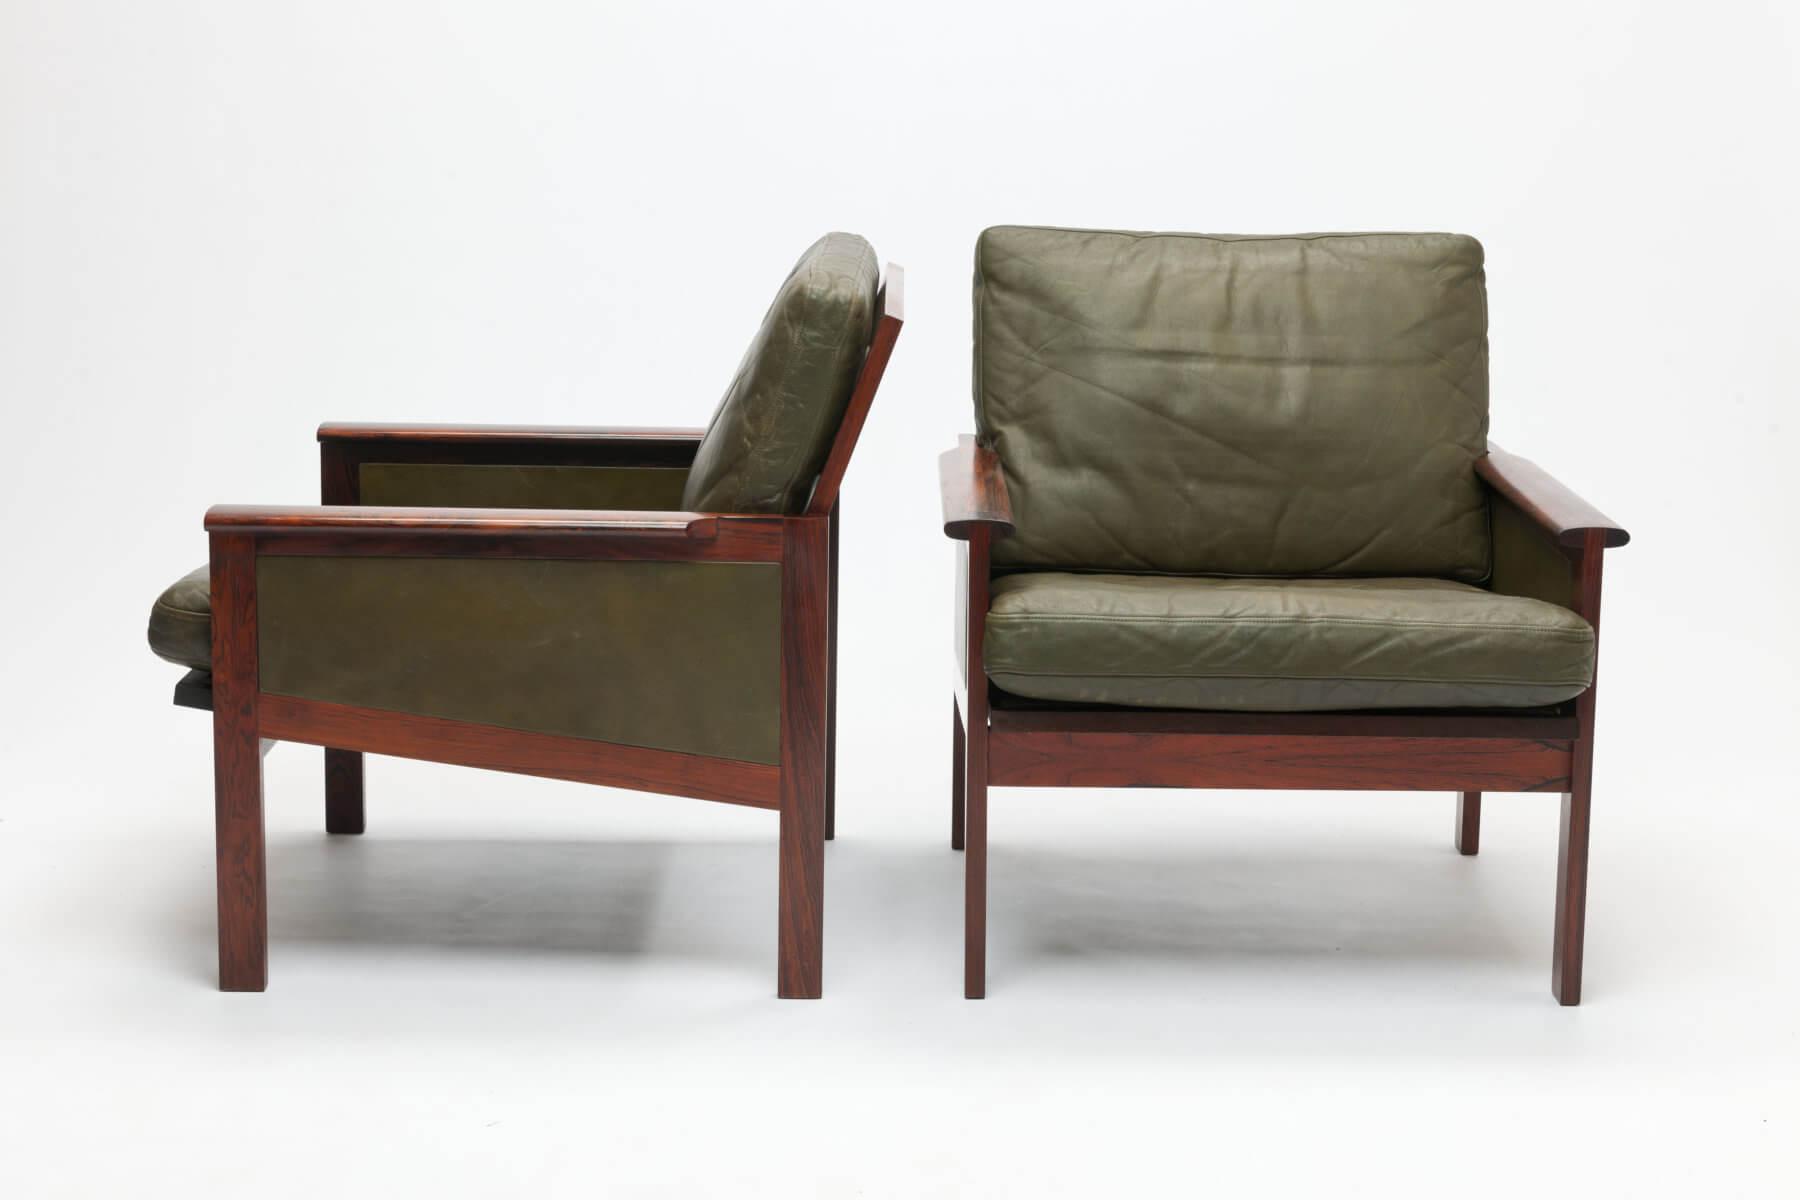 Vintage Illum Wikkelso palissander & leren fauteuils (2)